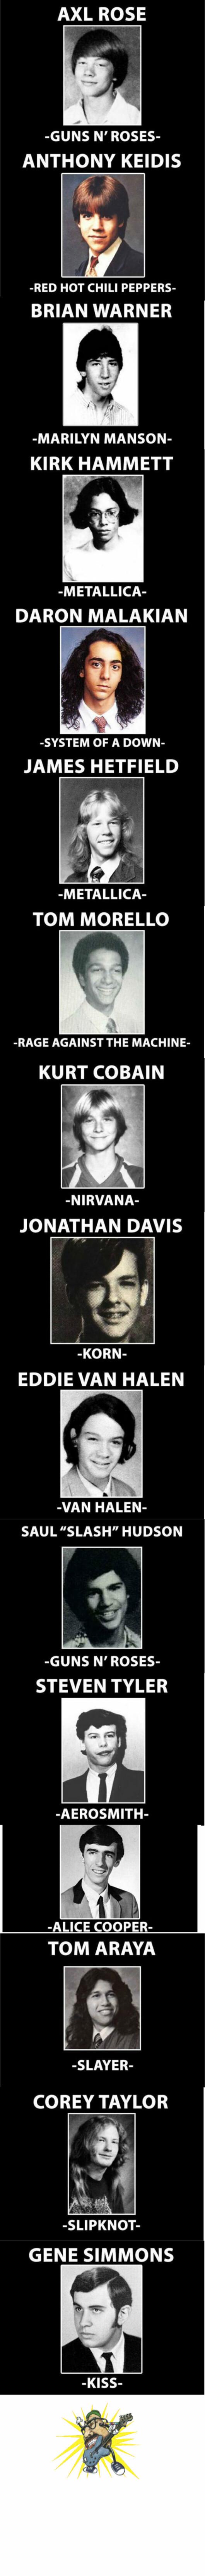 Transformarile unora dintre cei mai faimosi rockeri. Cum aratau Marilyn Manson, Axl Rose si Slash in adolescenta